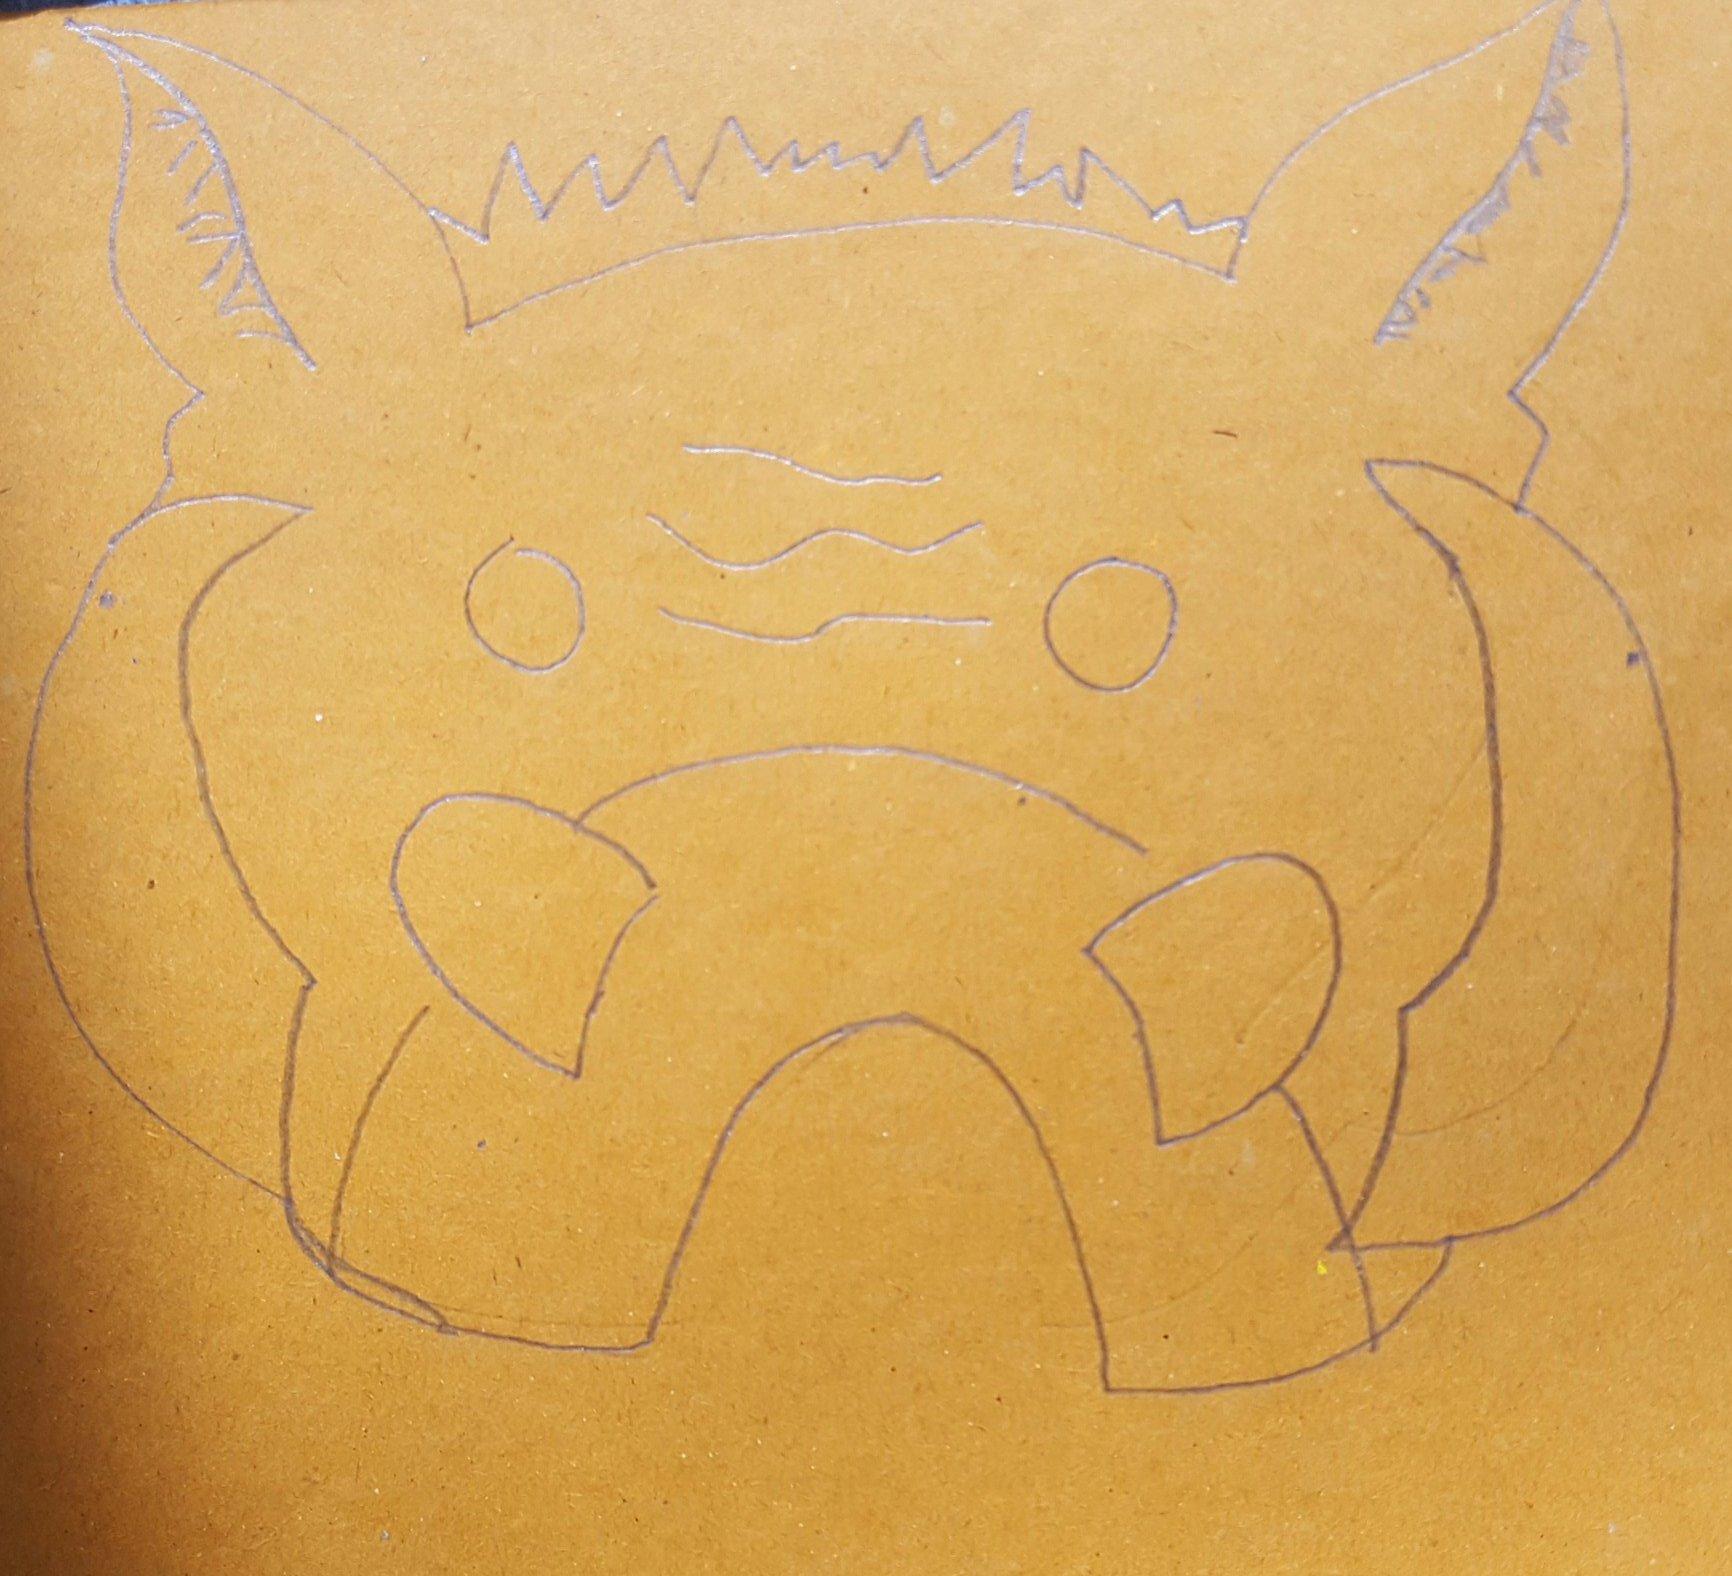 Making a kunekune mask. #edchatnz#creativity  @petermillett https://t.co/R7ee23gE16